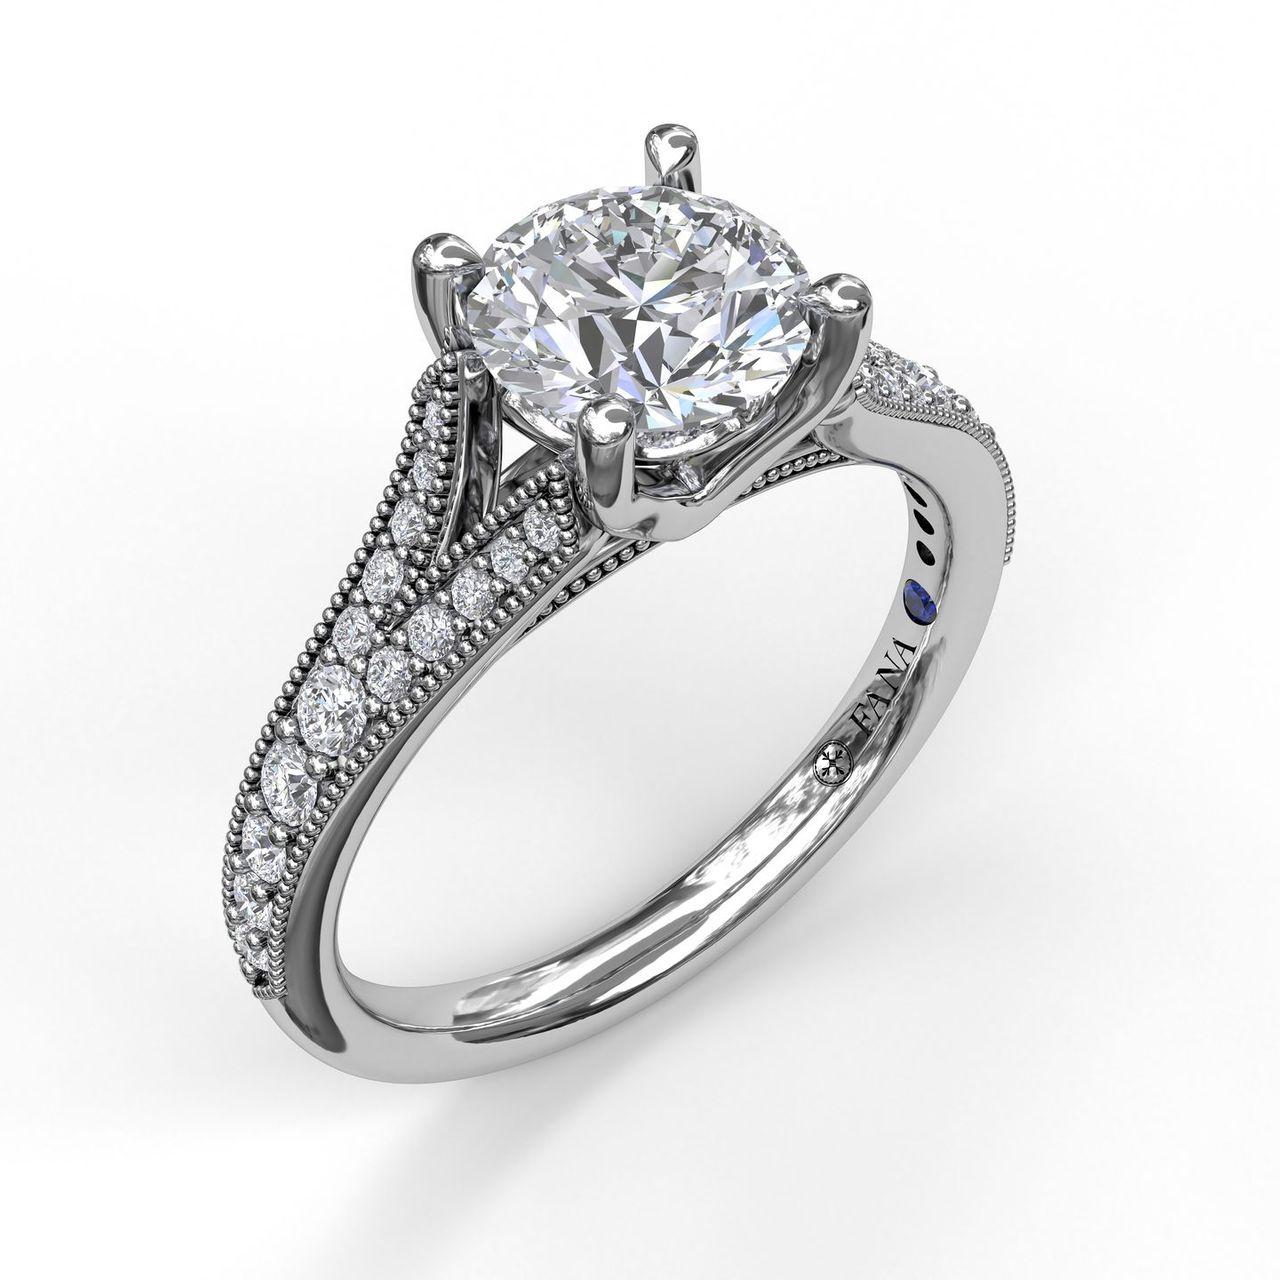 Subtle Split Band Engagement Ring With Milgrain Detail